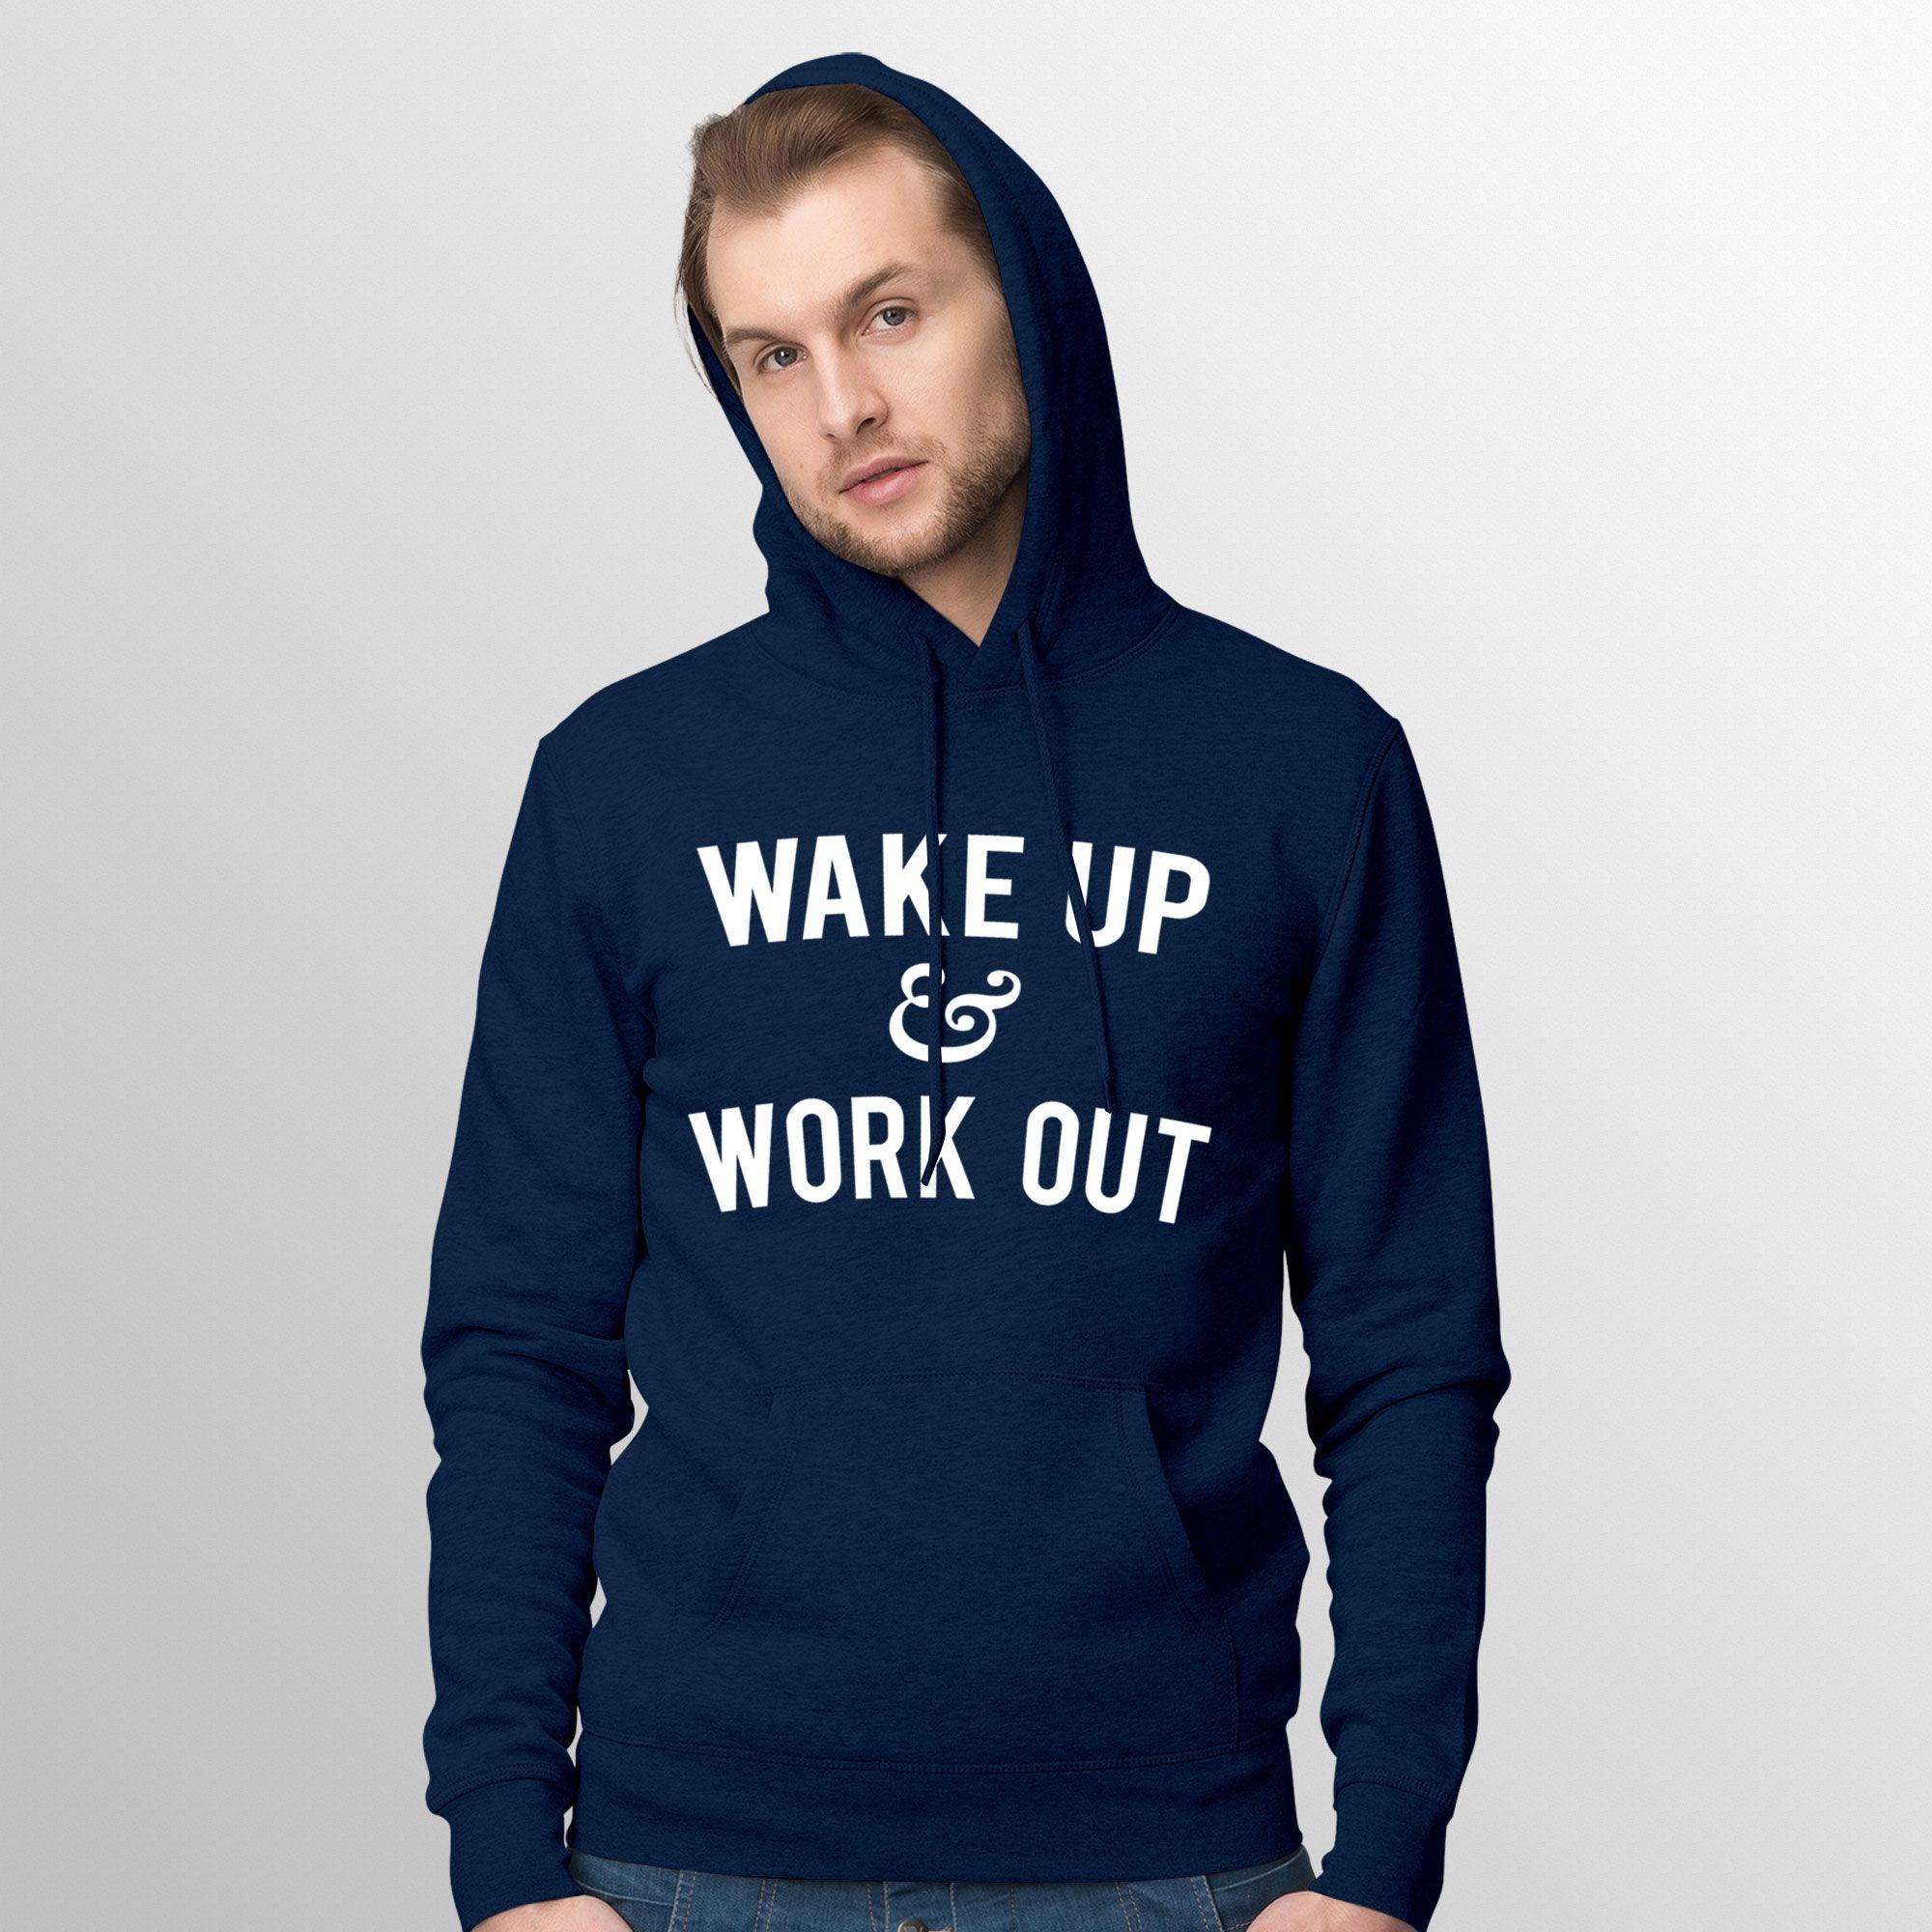 Wake Up Work Out Hoodie Quote Slogan Illustration I Woke Tumblr Tee Personalised Unisex Blog Fashion Drawing Funny Hipster Customised Joke Gift